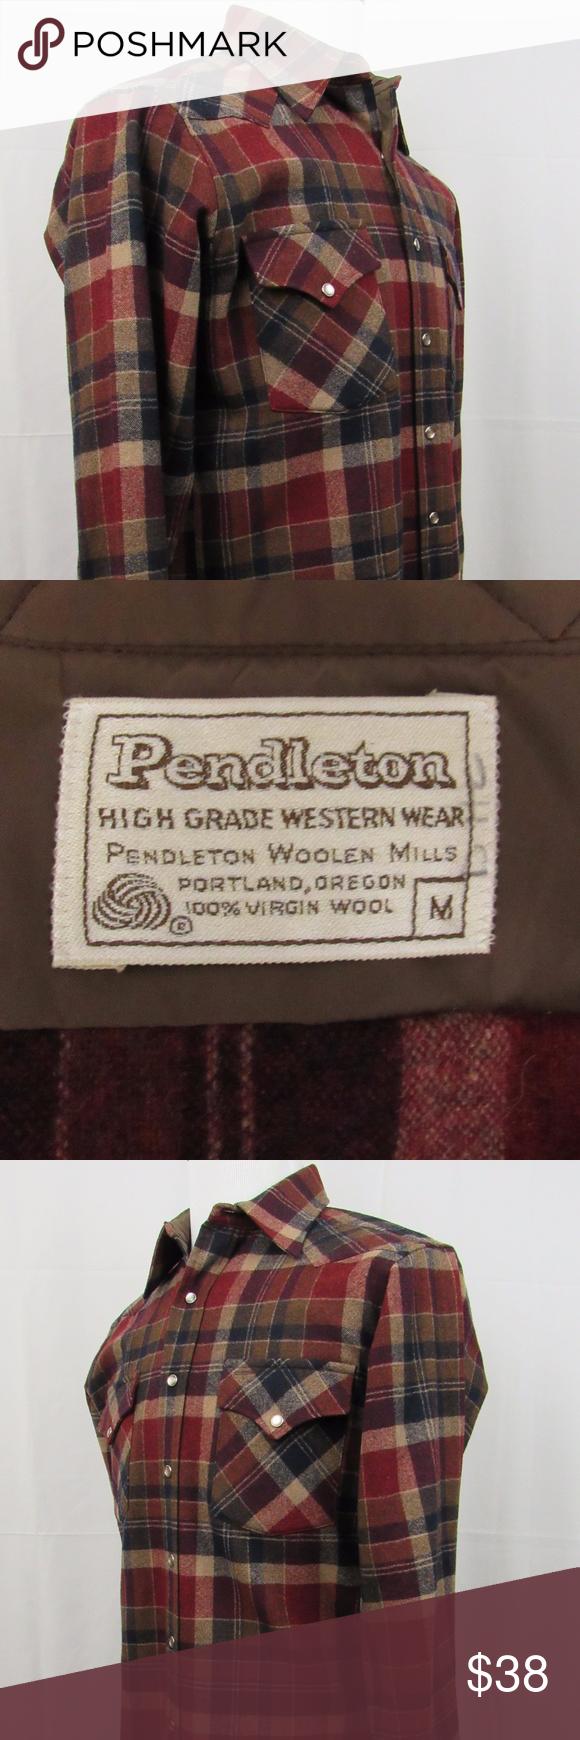 Pendleton Men's Flannel Brown Plaid Shirt 100% Virgin Wool Long Sleeve (M) WUC+